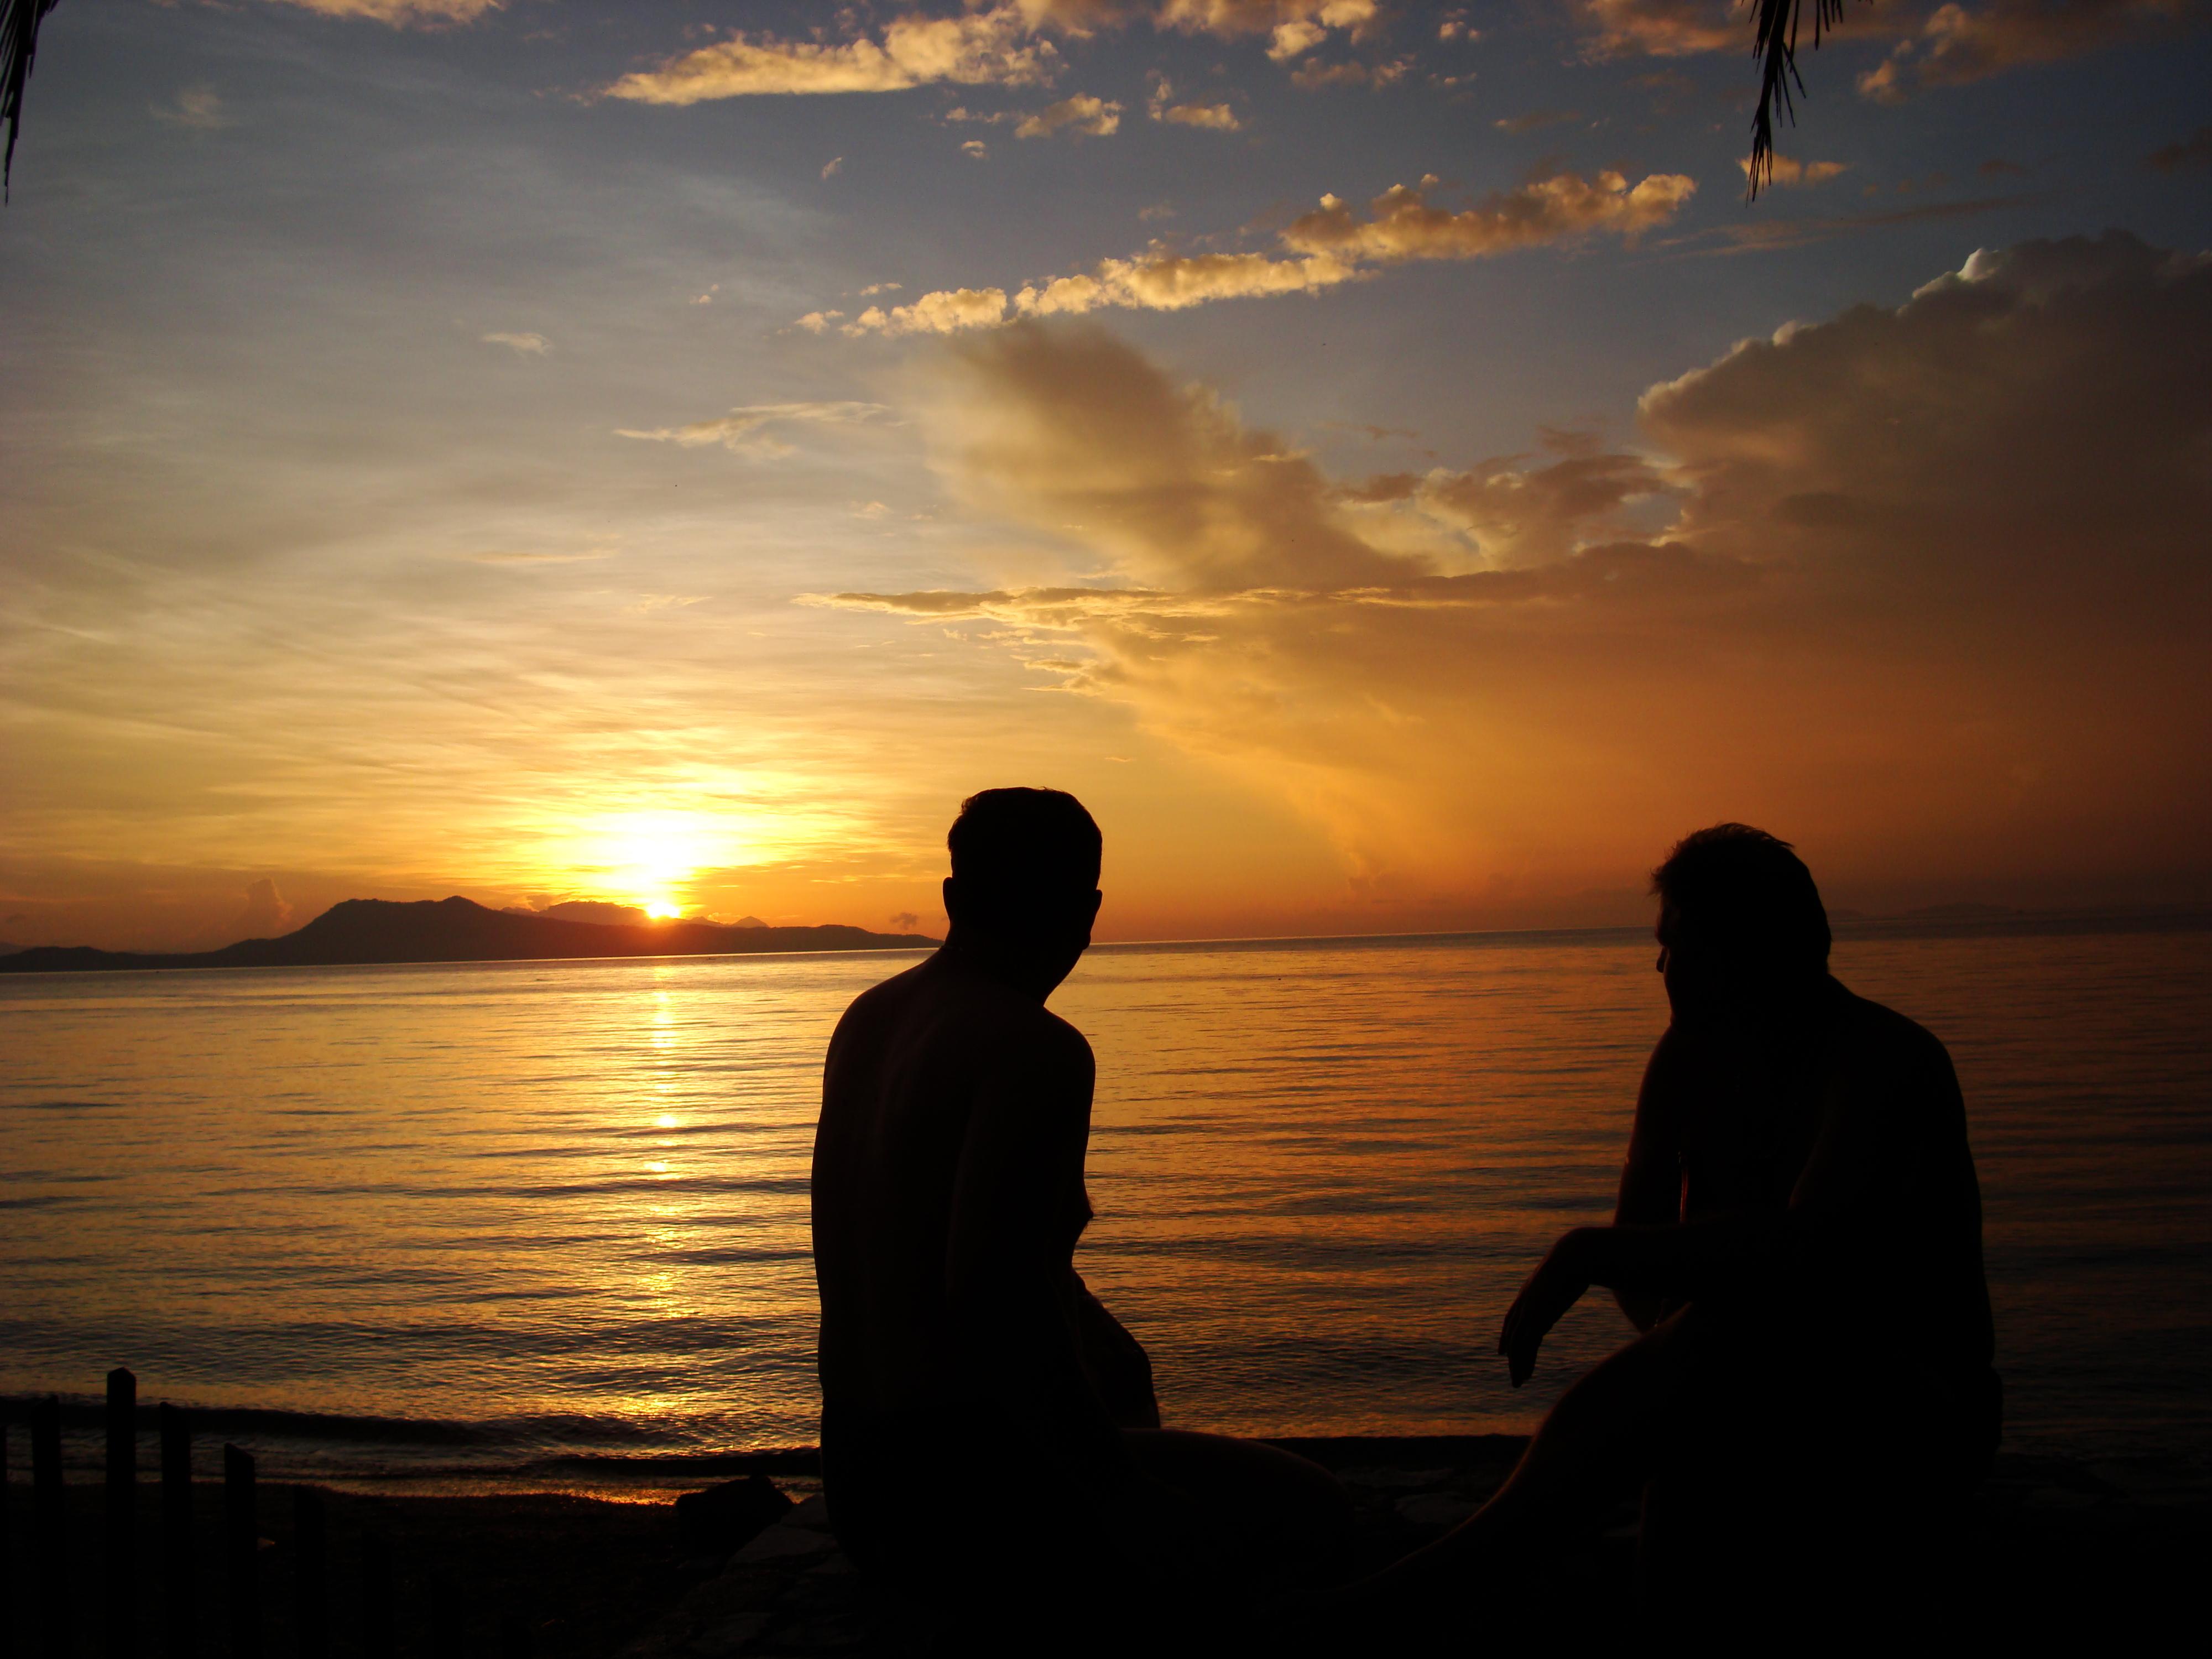 Sunrise Philippines Mindoro Island Tabinay 50